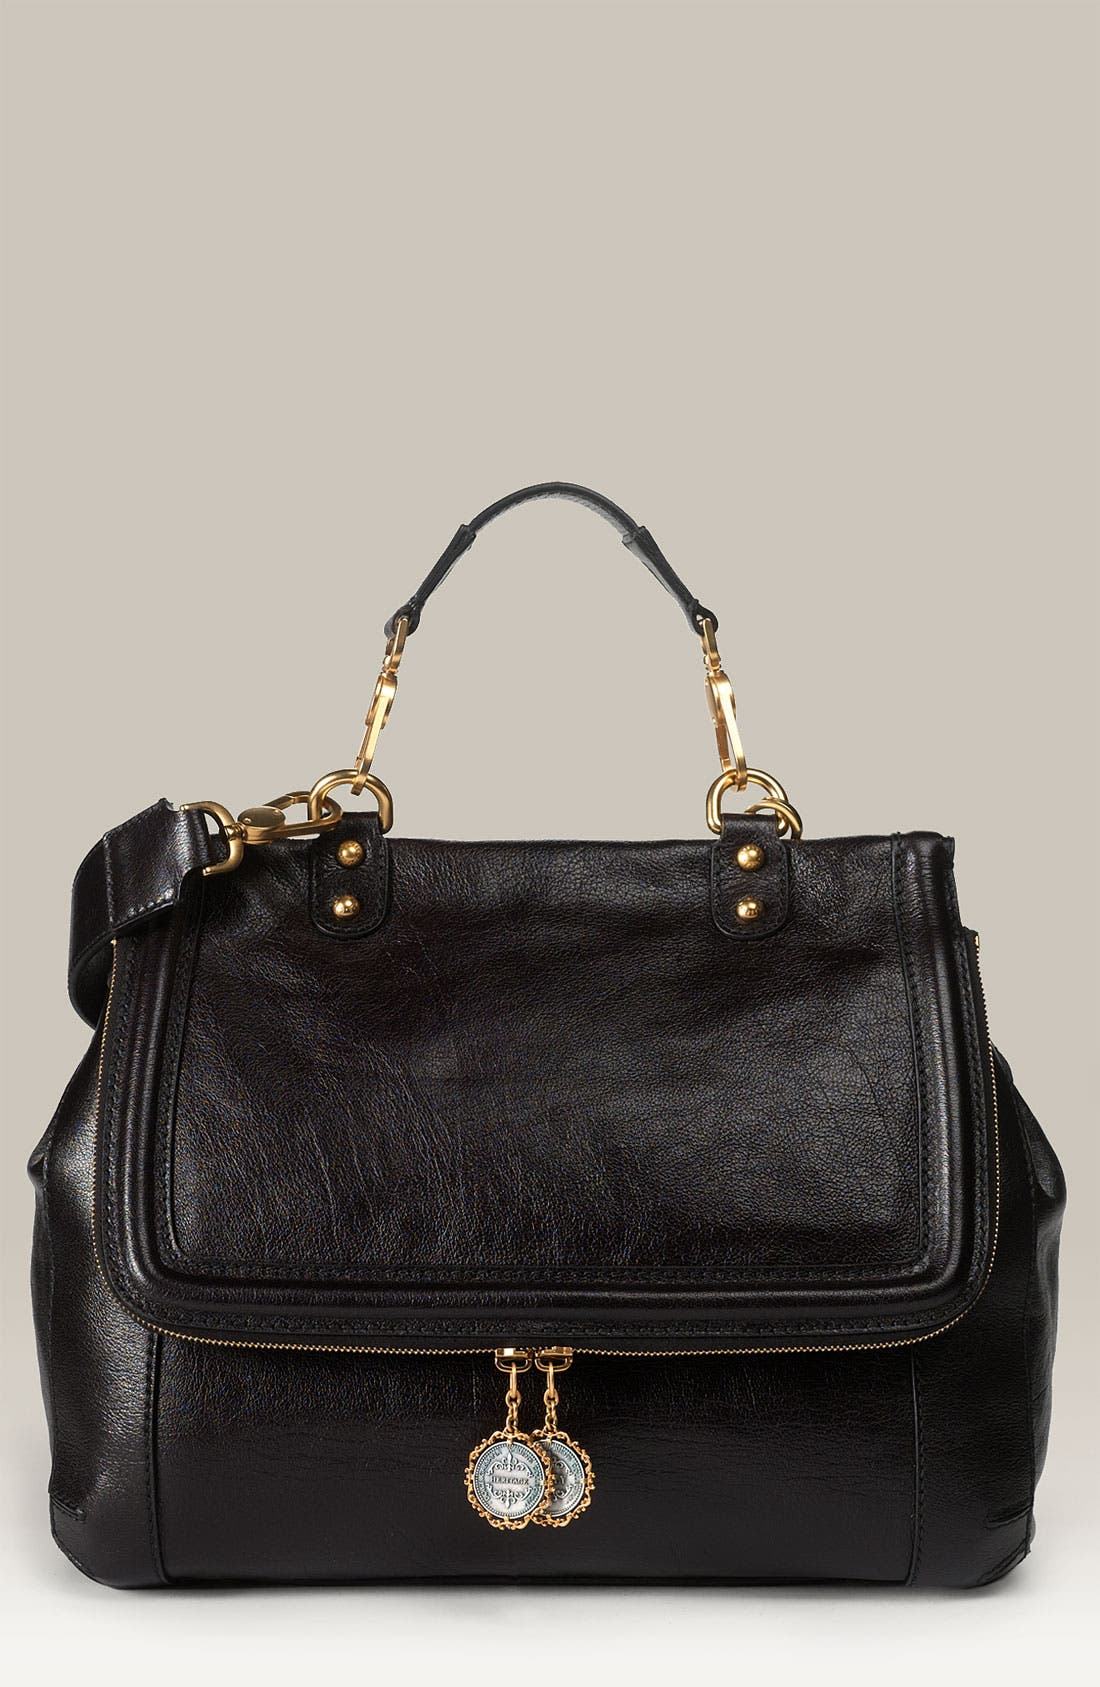 Alternate Image 1 Selected - Dolce&Gabbana 'Miss Rose' Buffalo Leather Satchel